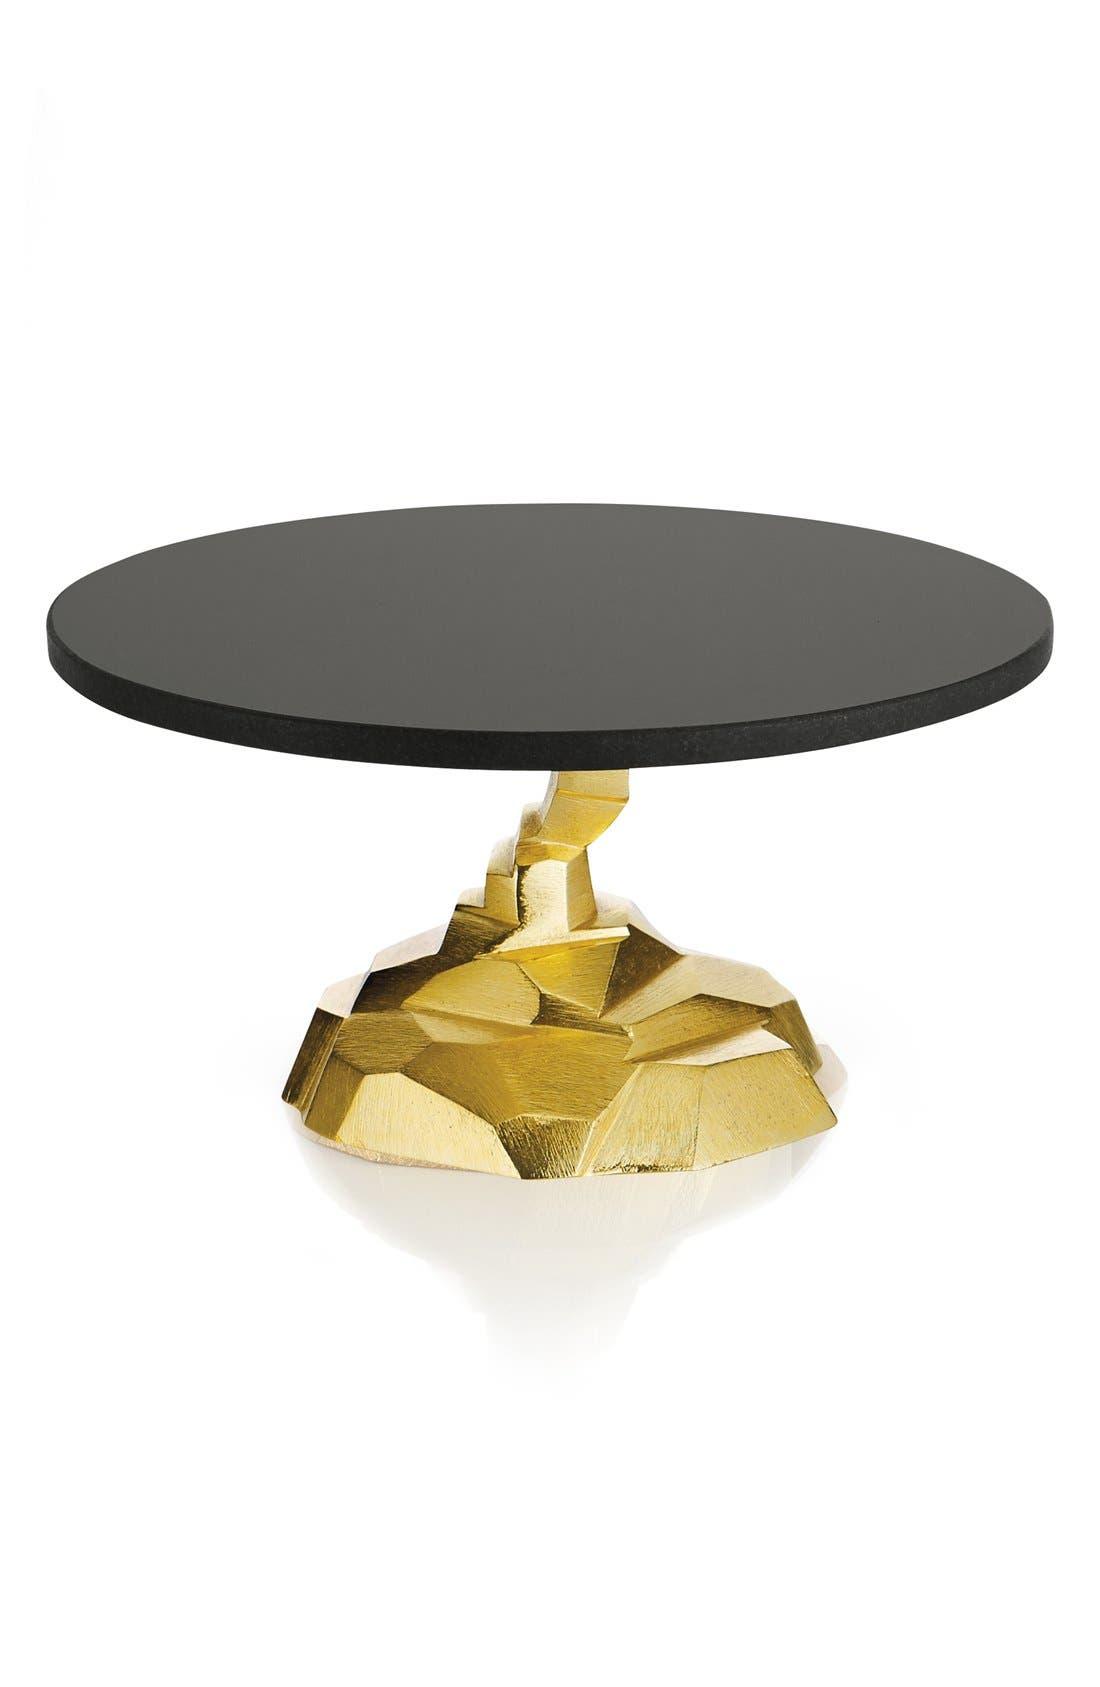 Michael Aram 'Rock' Cake Stand